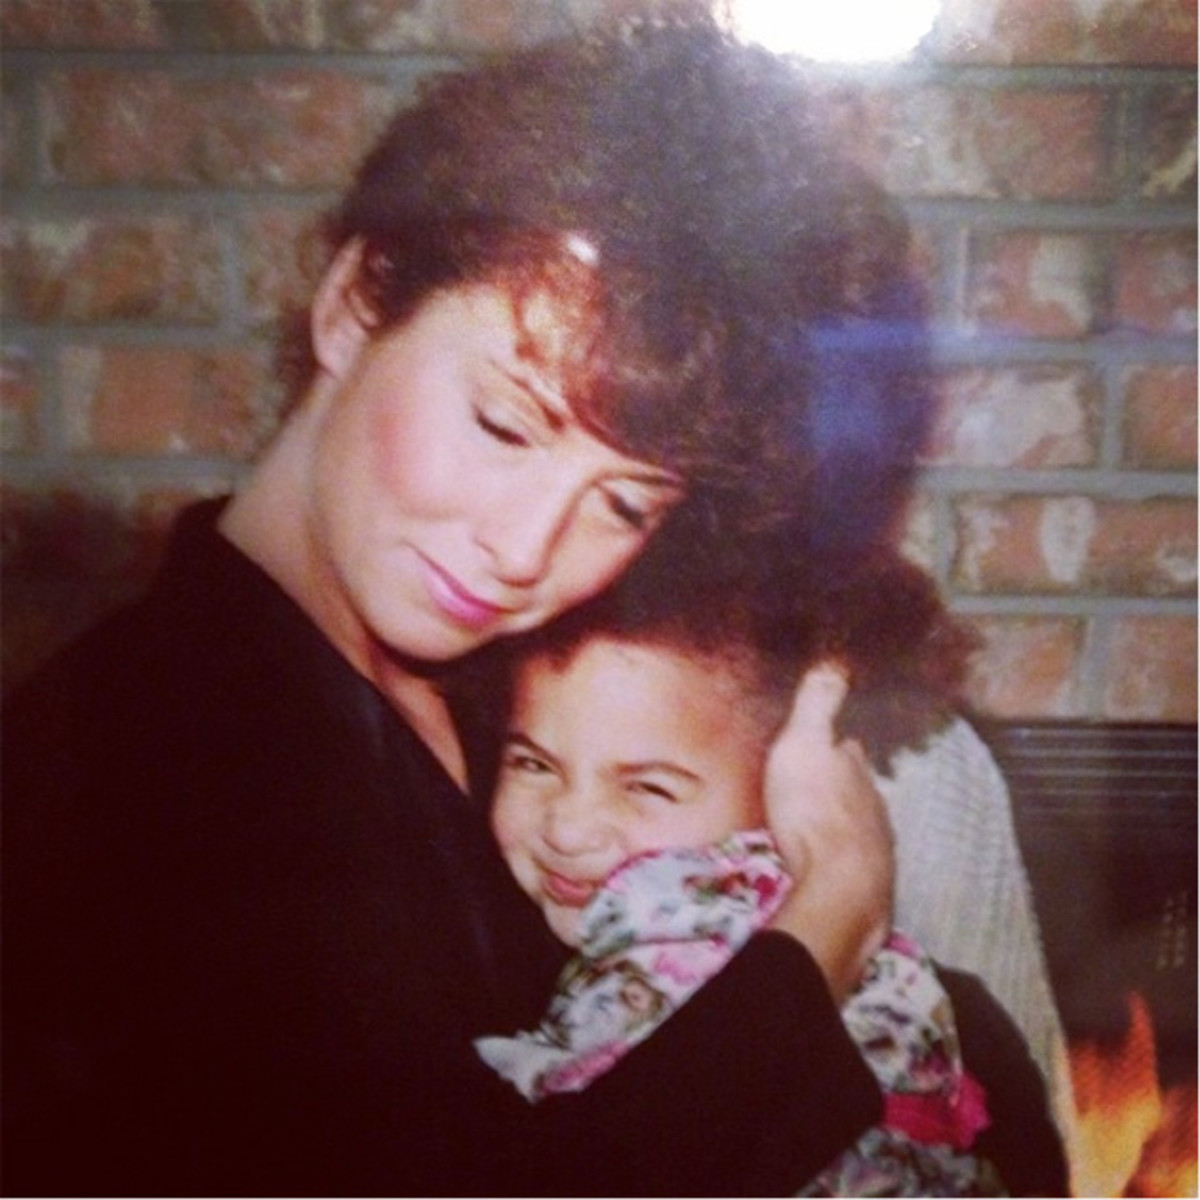 Sydney Leroux and her mother, Sandi.